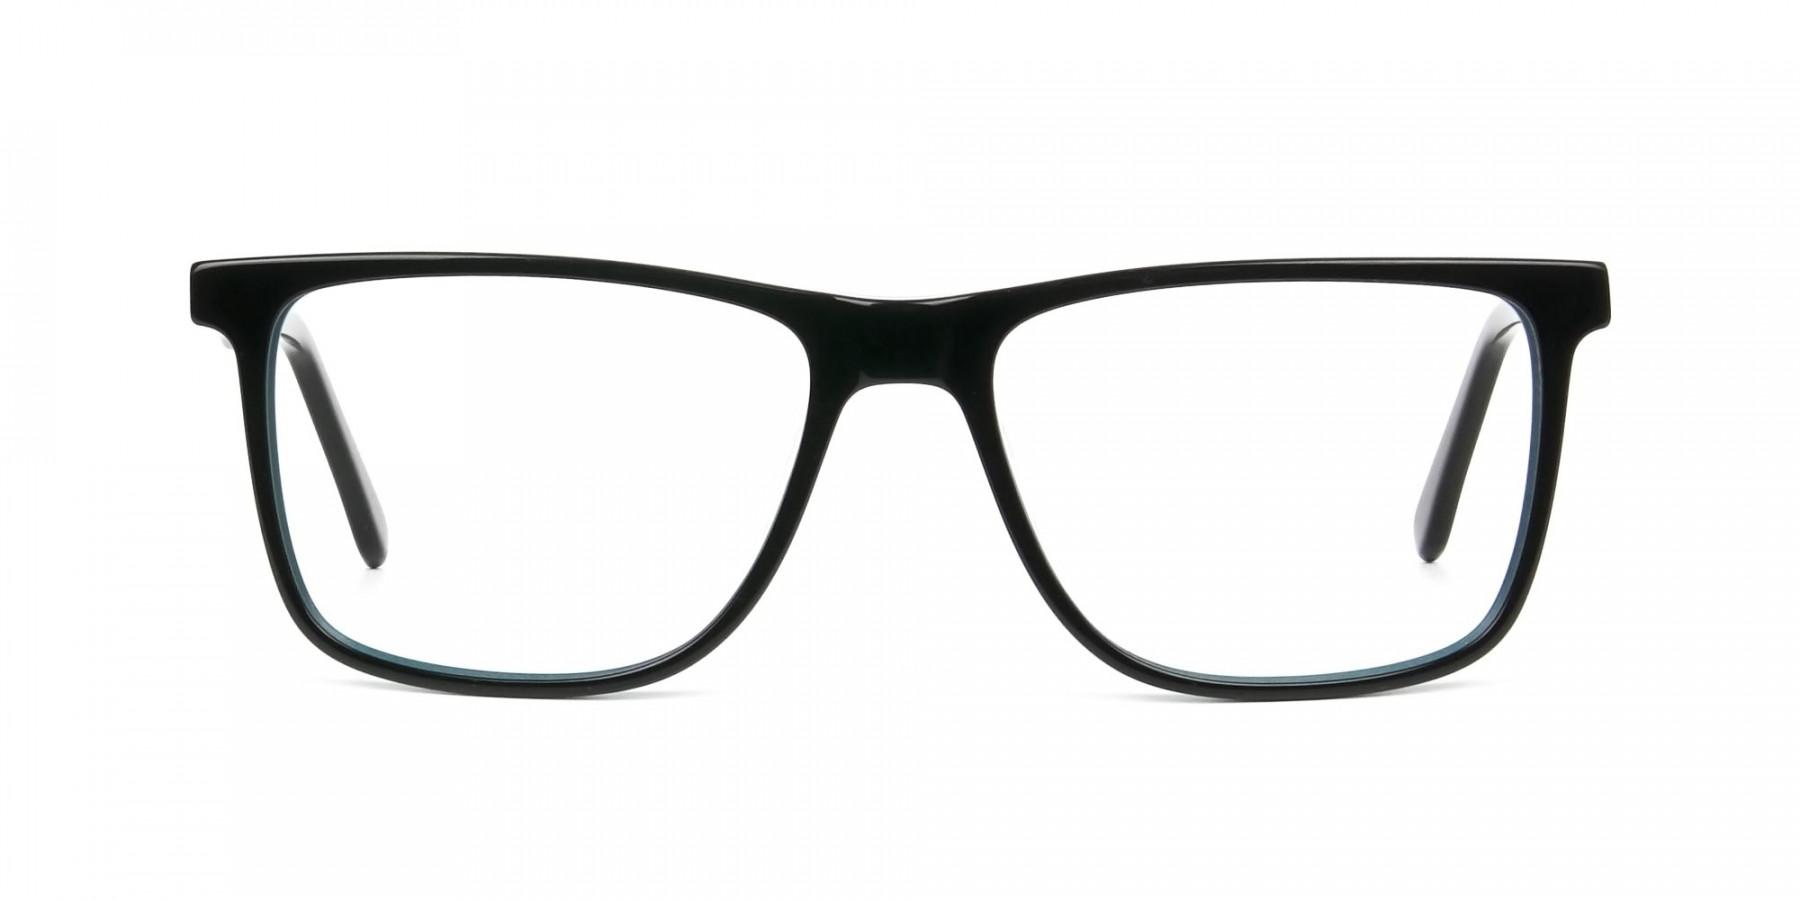 Designer Black & Teal Spectacles in Rectangular - 1